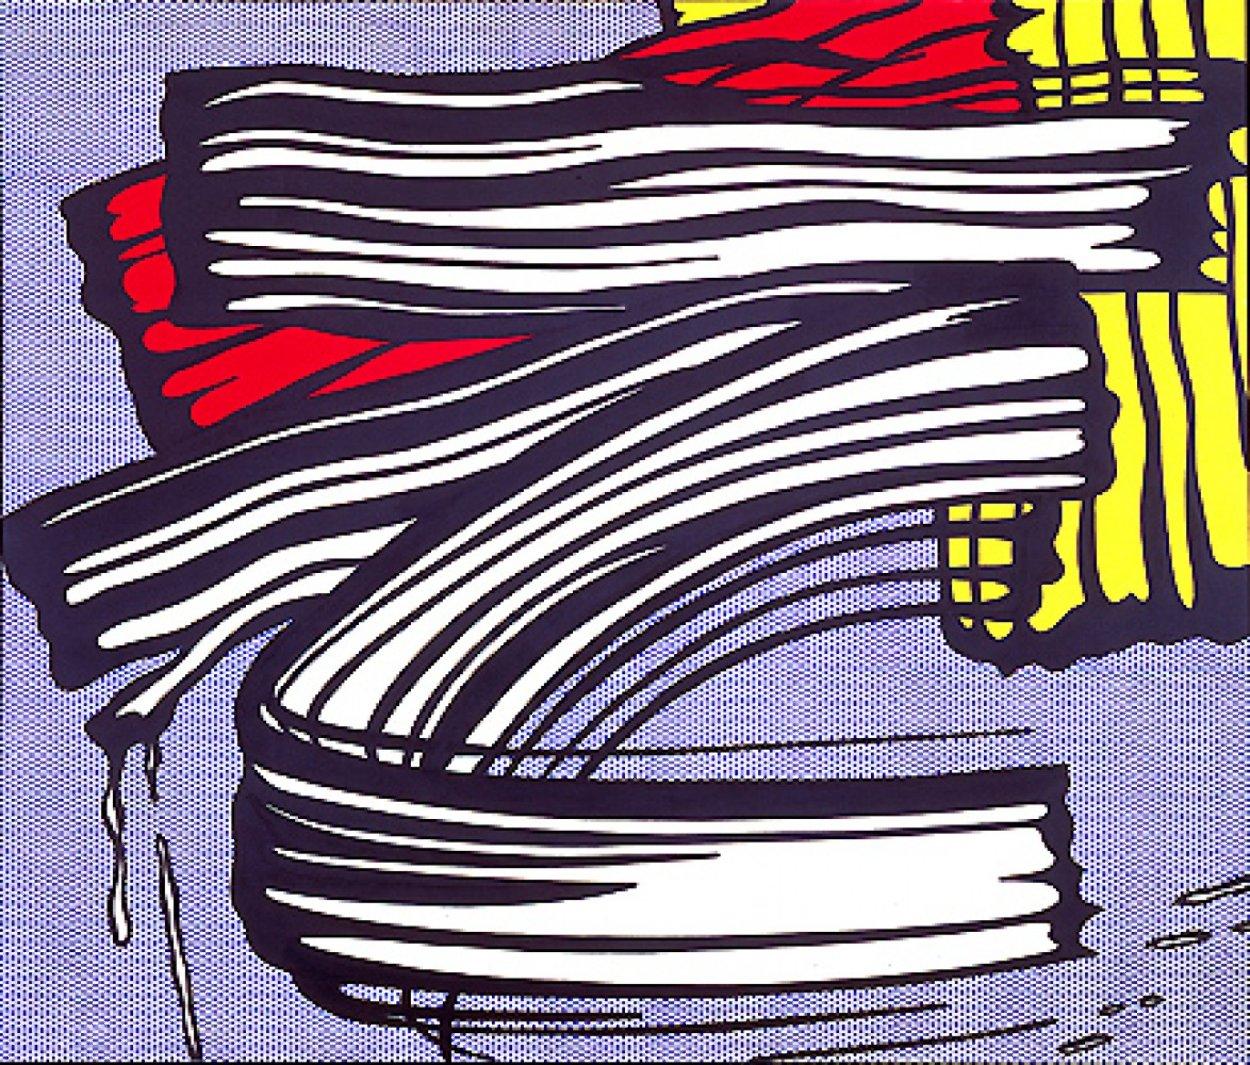 Little Big Painting  1965 Super Huge Limited Edition Print by Roy Lichtenstein